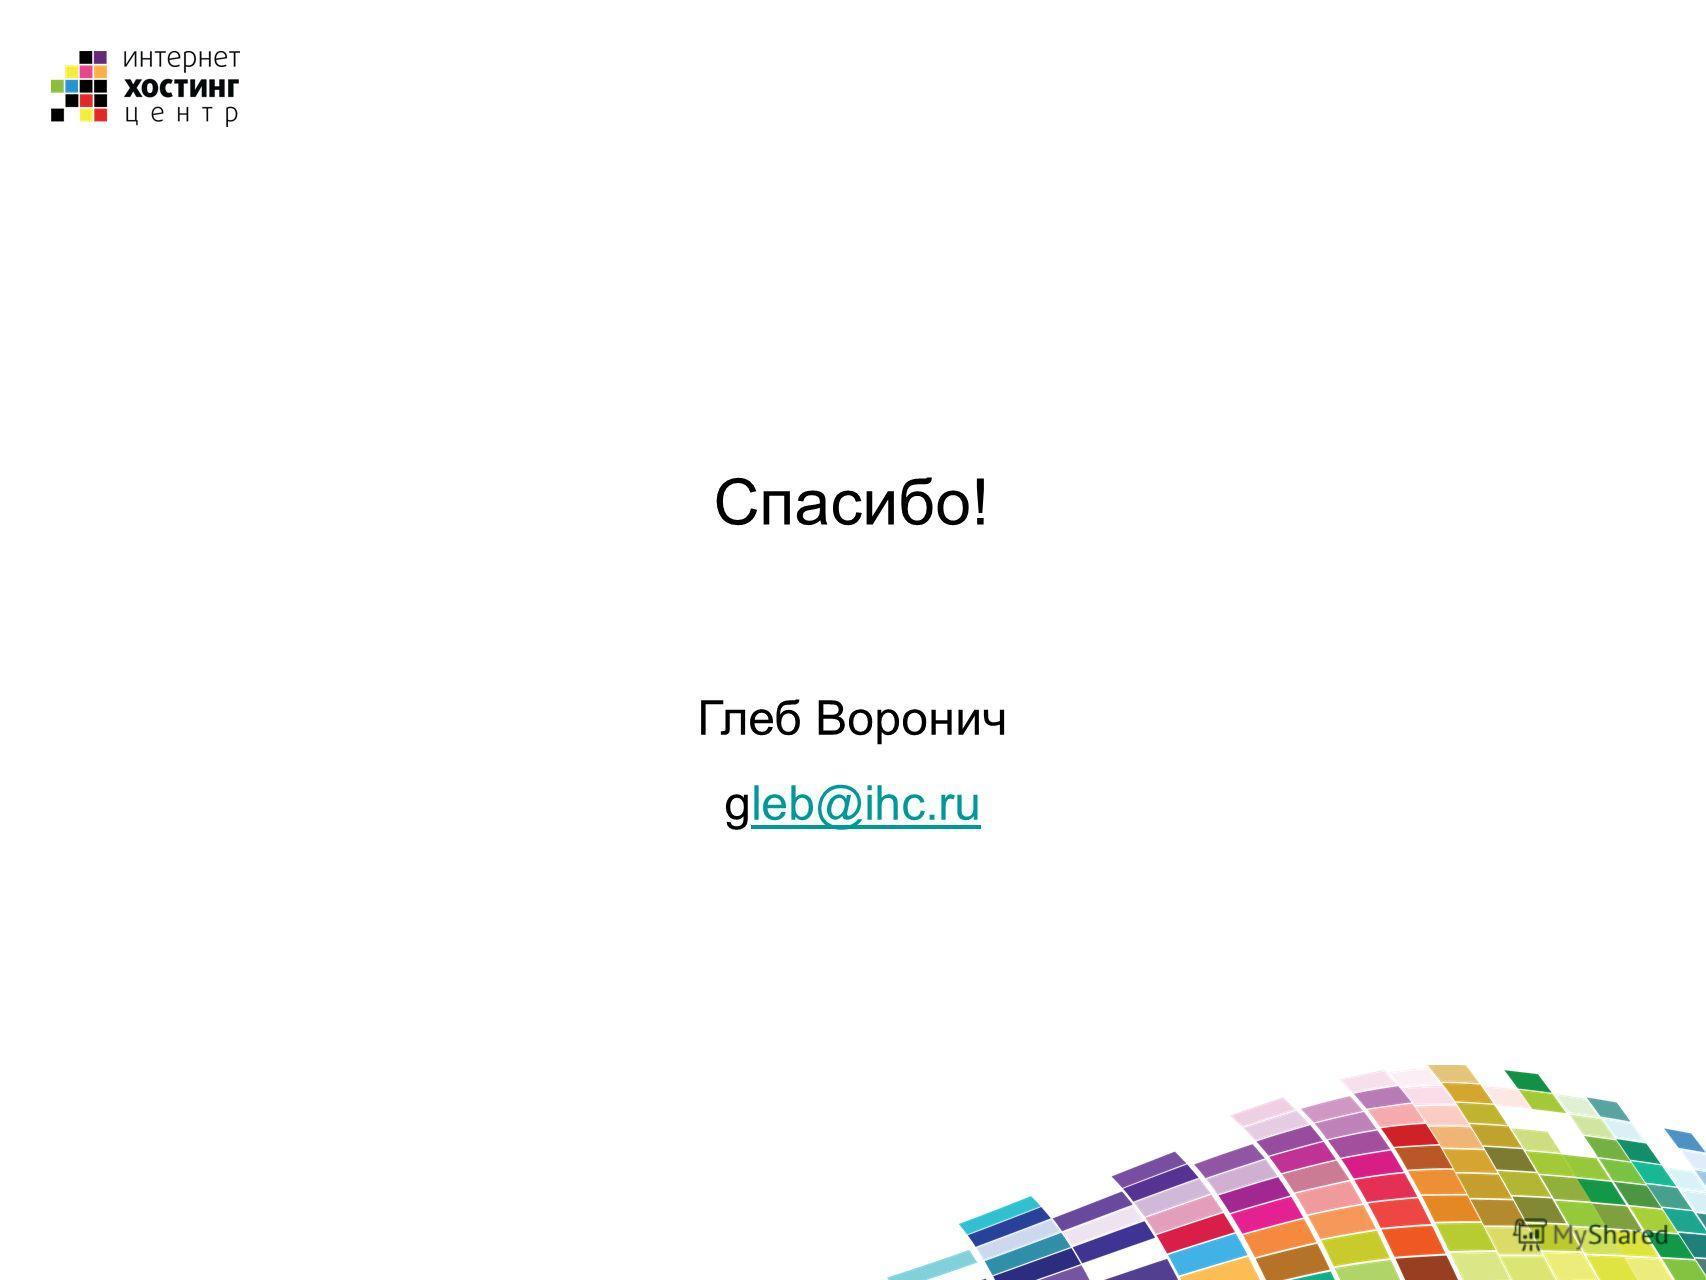 Спасибо! Глеб Воронич gleb@ihc.ruleb@ihc.ru